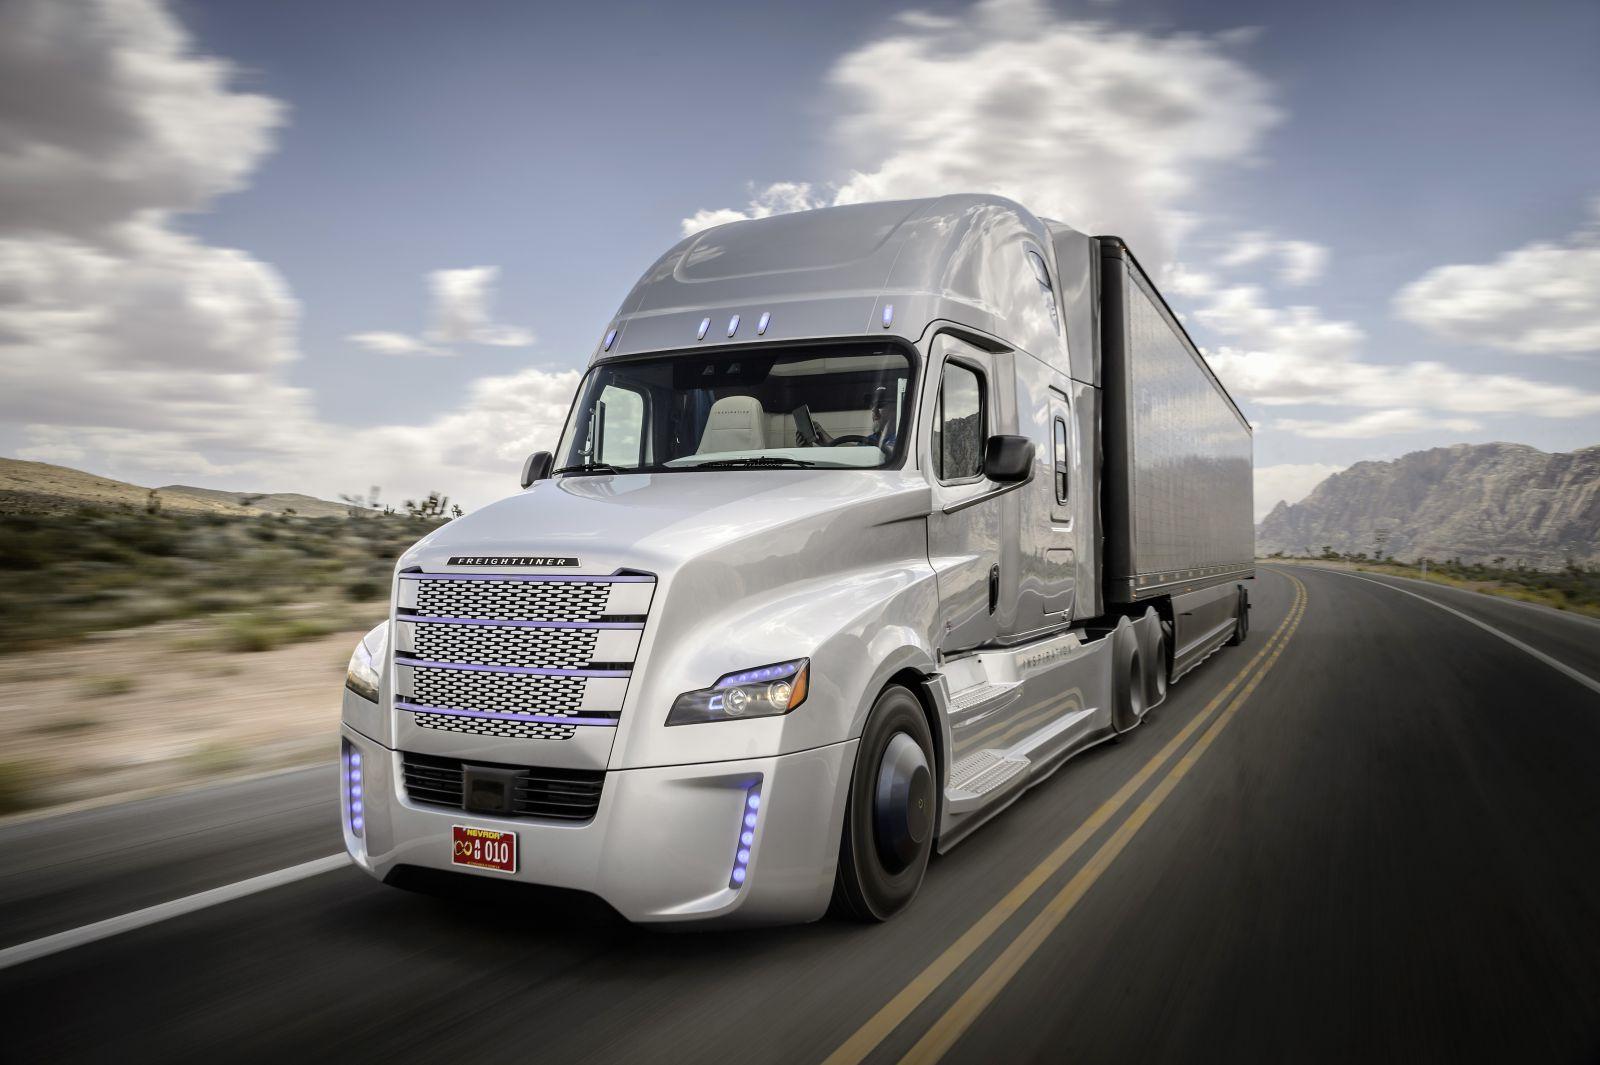 Freightliner Inspiration 1